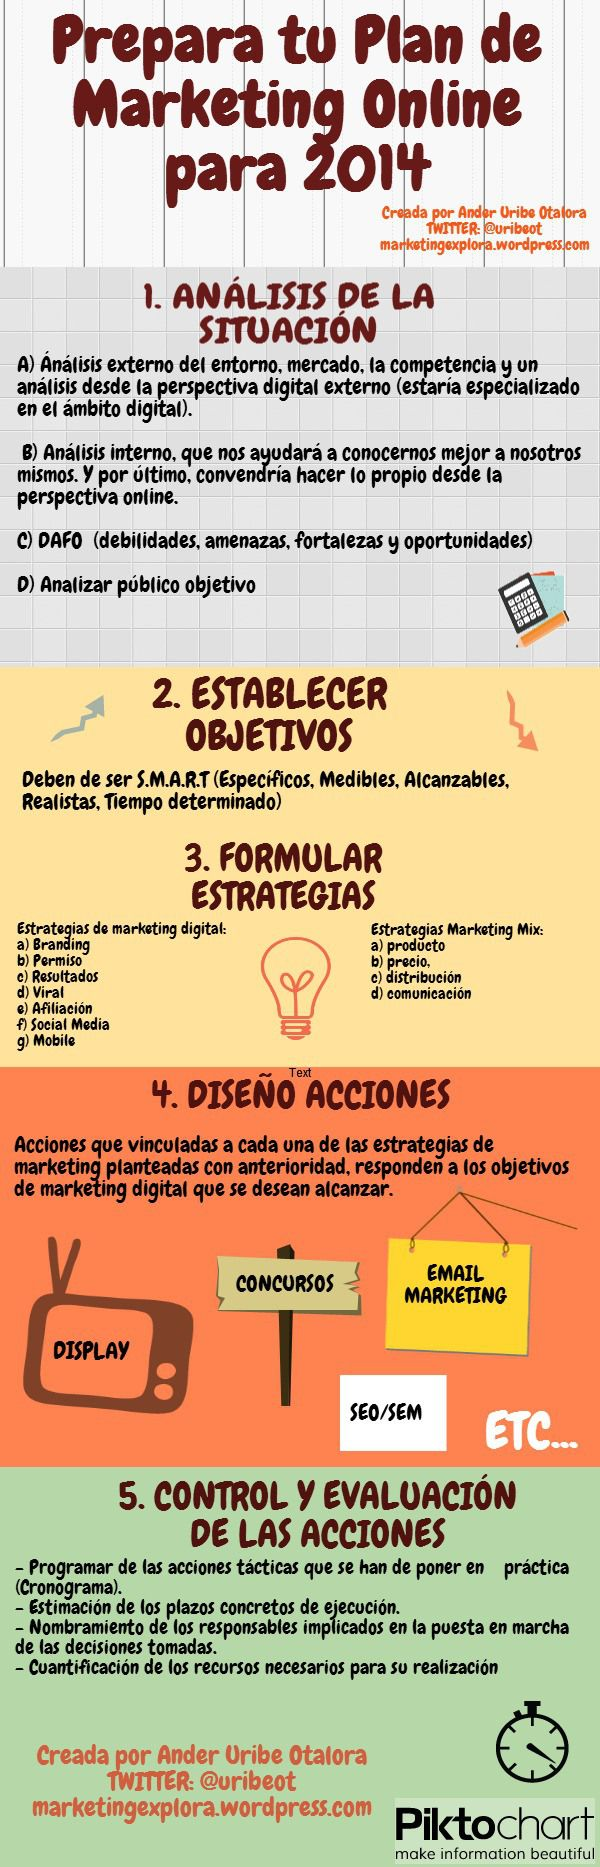 Cómo preparar tu Plan de Marketing online #infografia #infographic #marketing